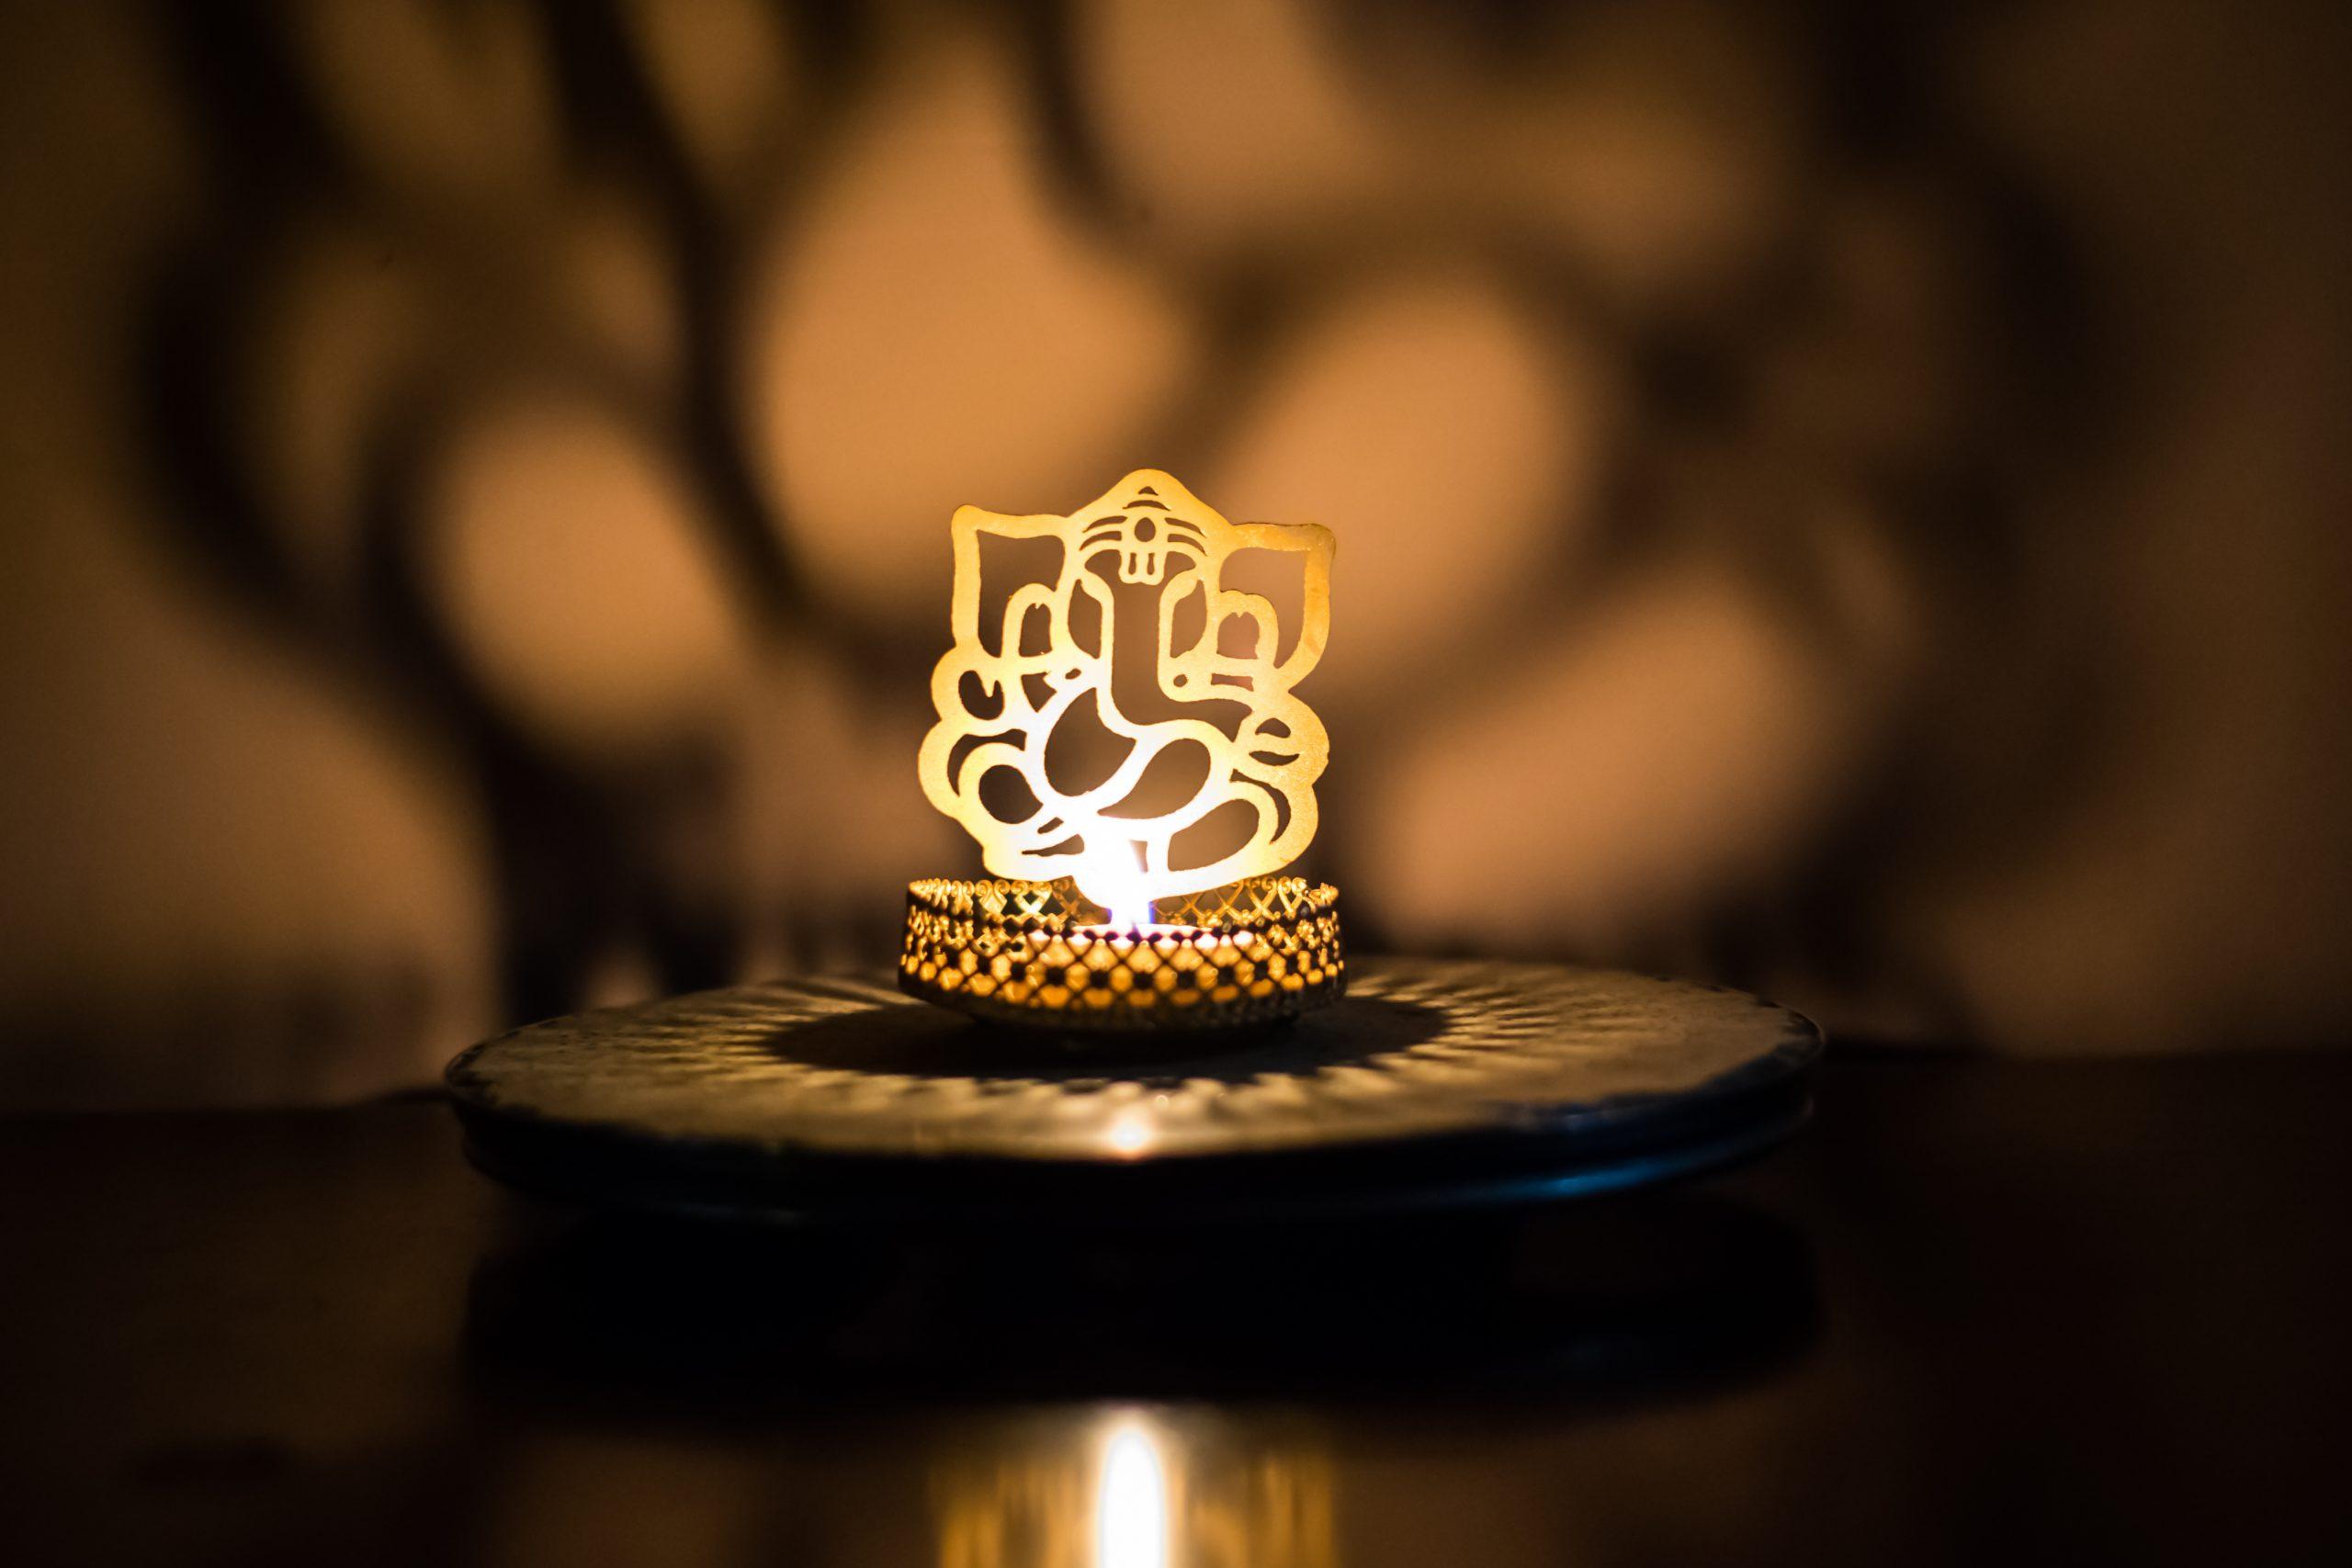 Lord Ganesh figurine with lights